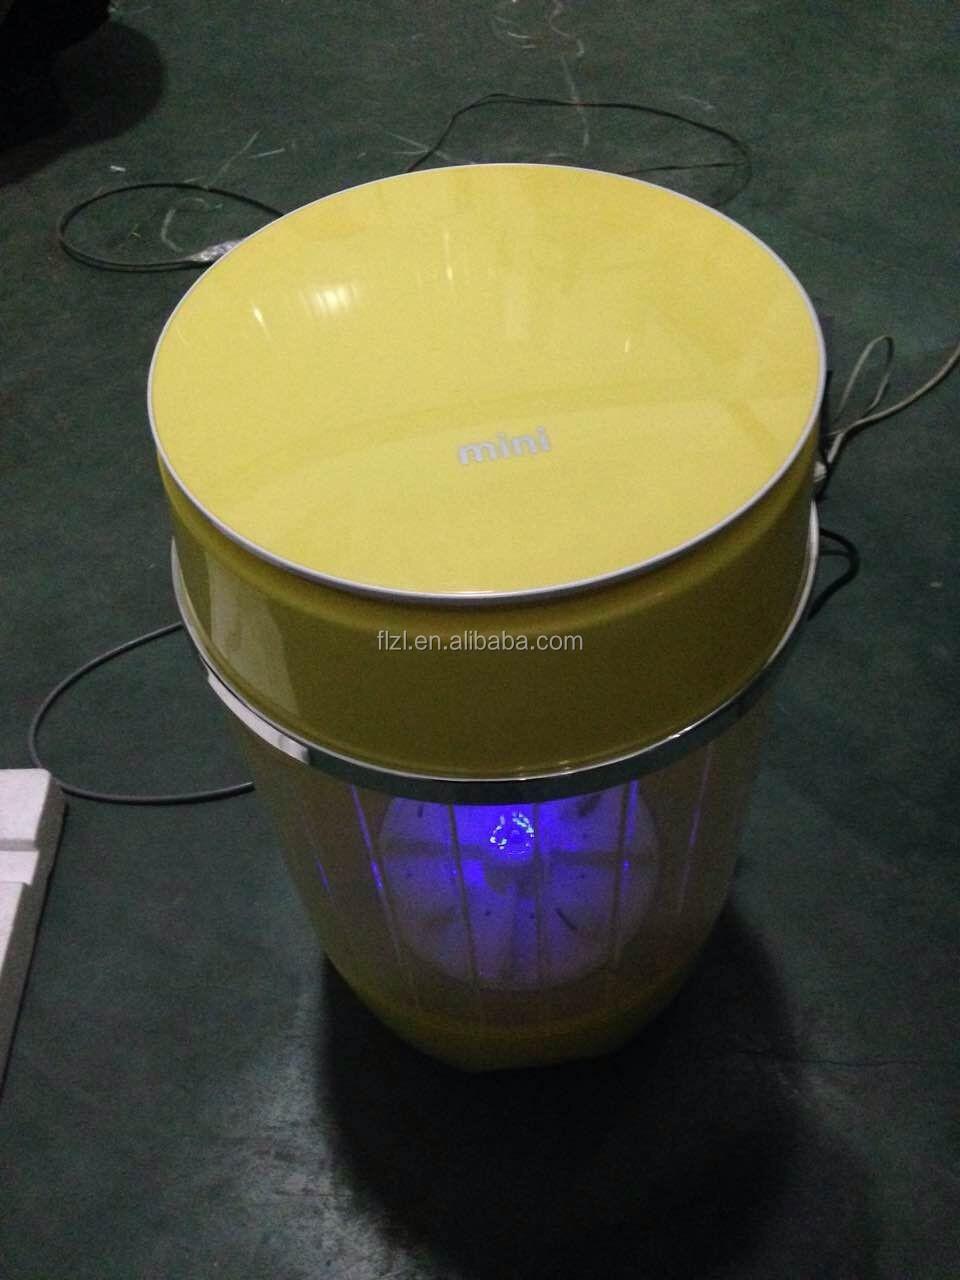 Miniature Washing Machine For Sale 3kg Single Tub Mini Washing Machine With Dryer Single